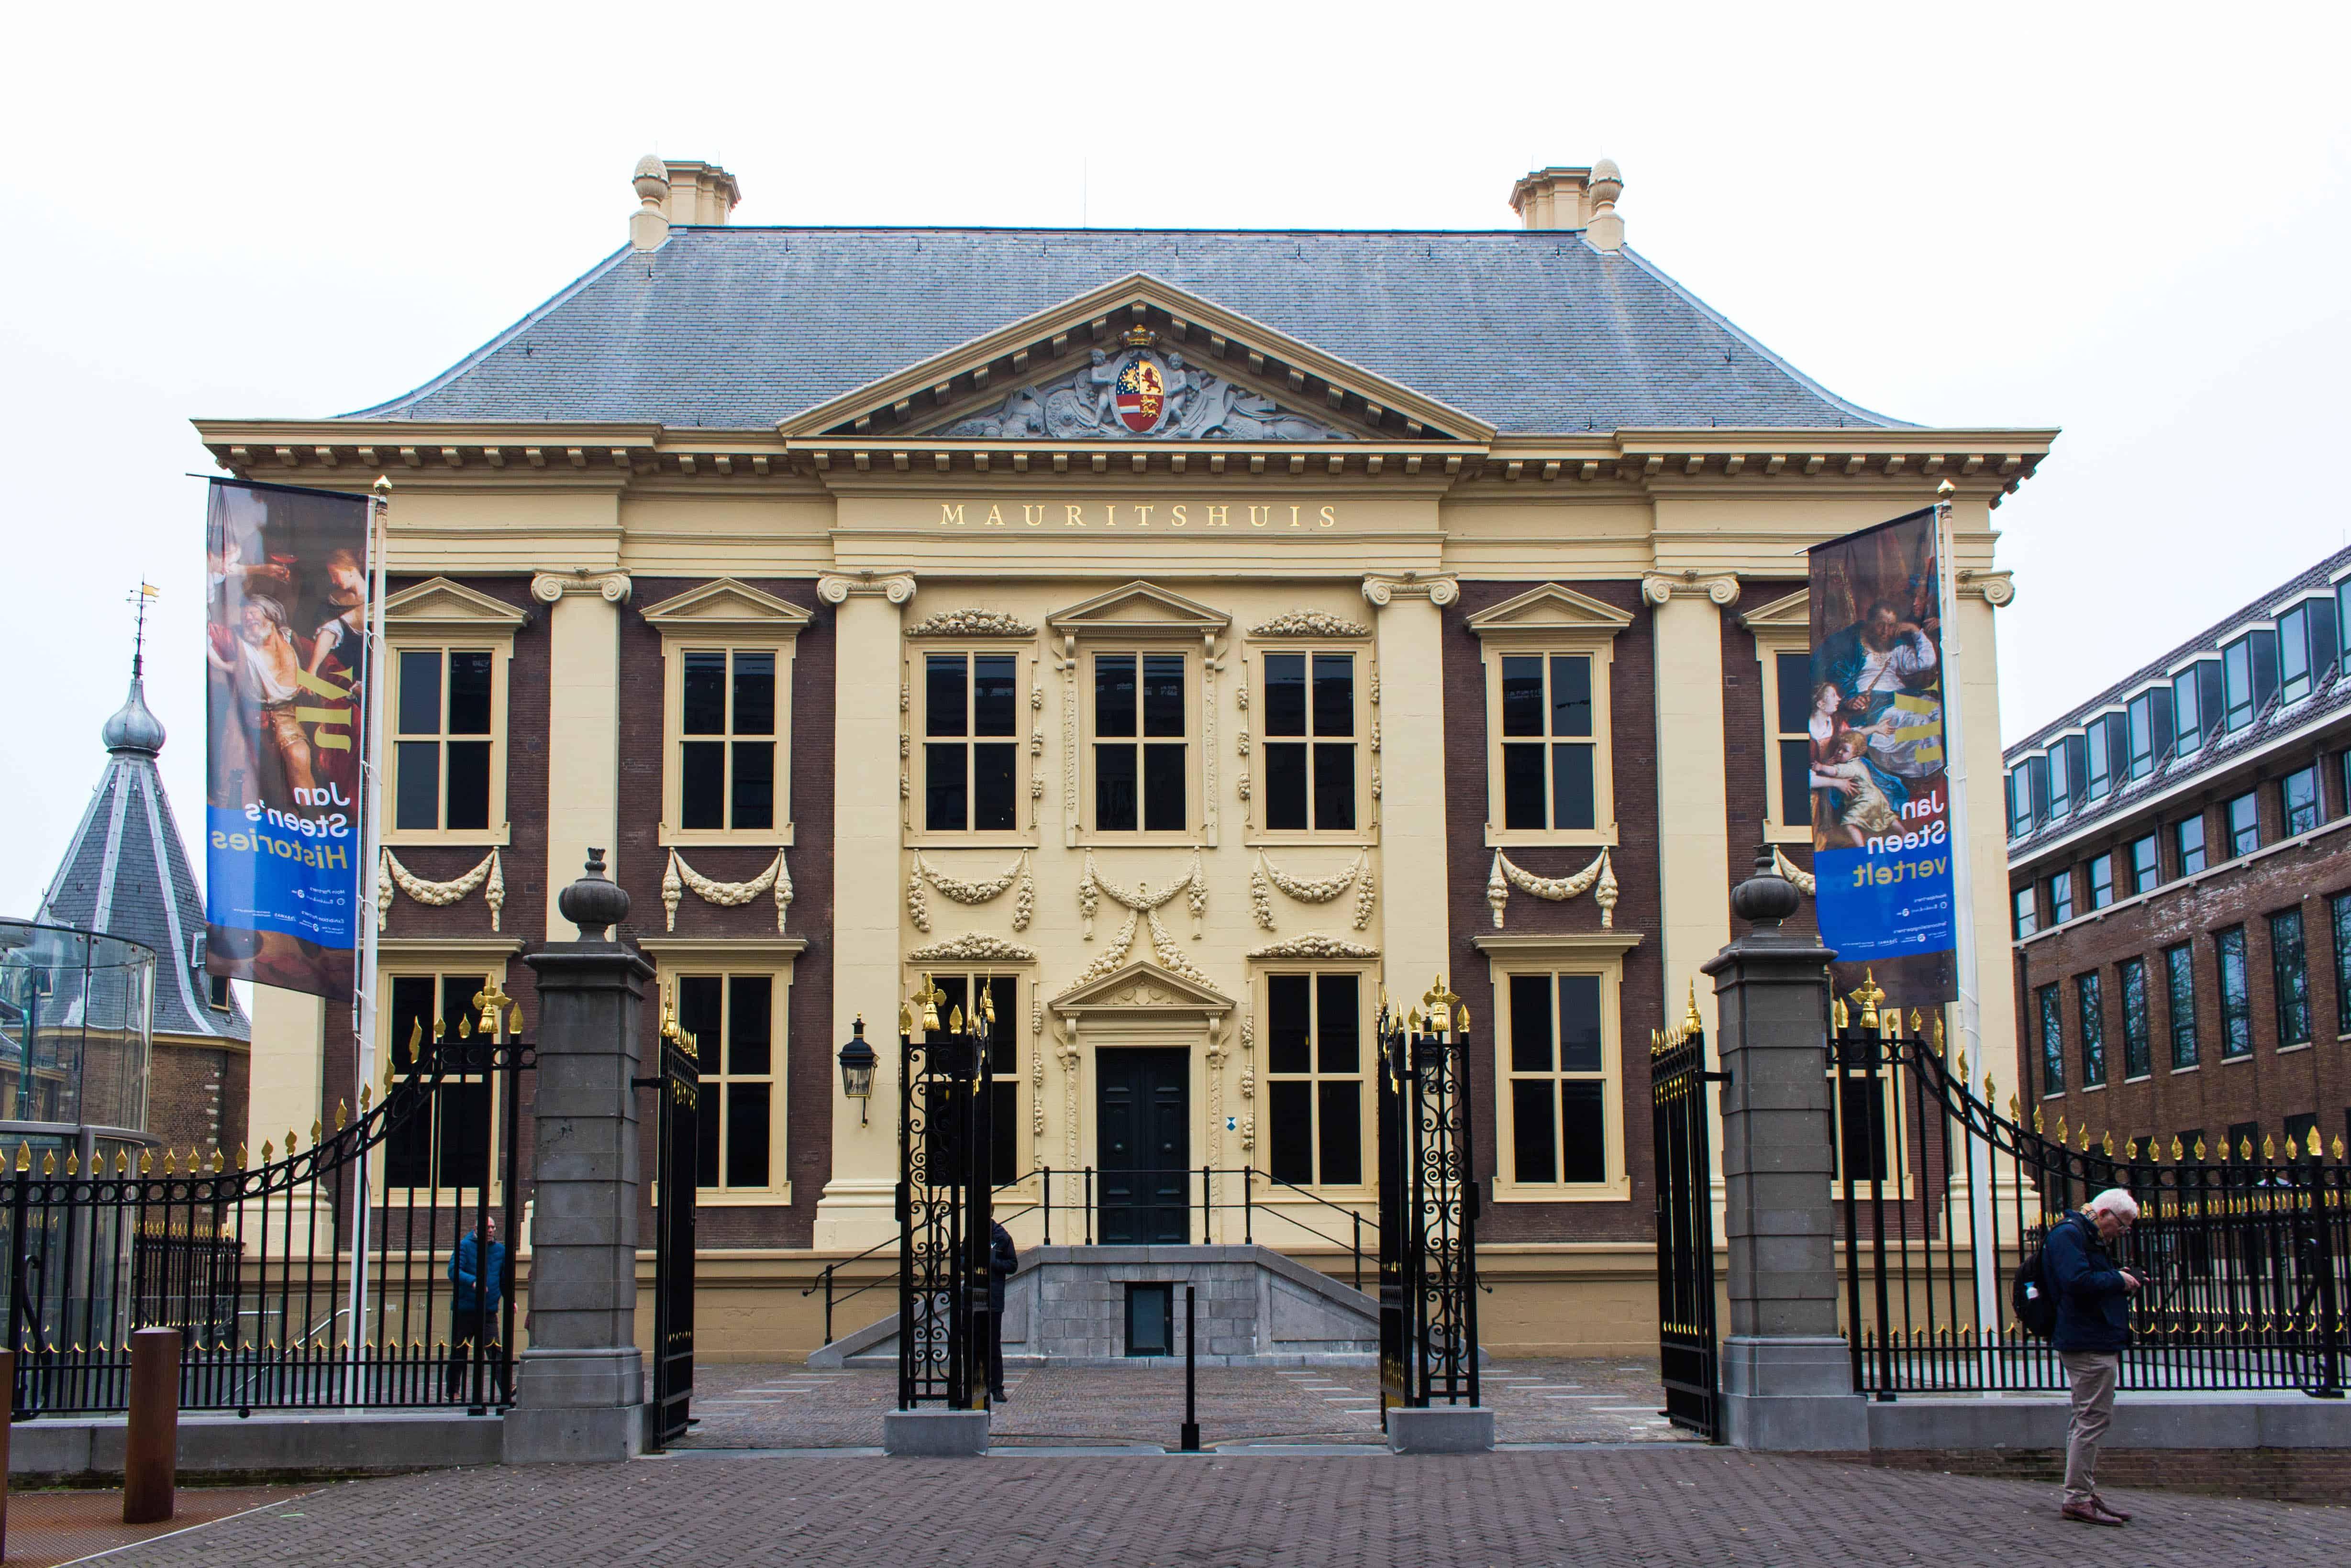 Mauritshuis Gallery